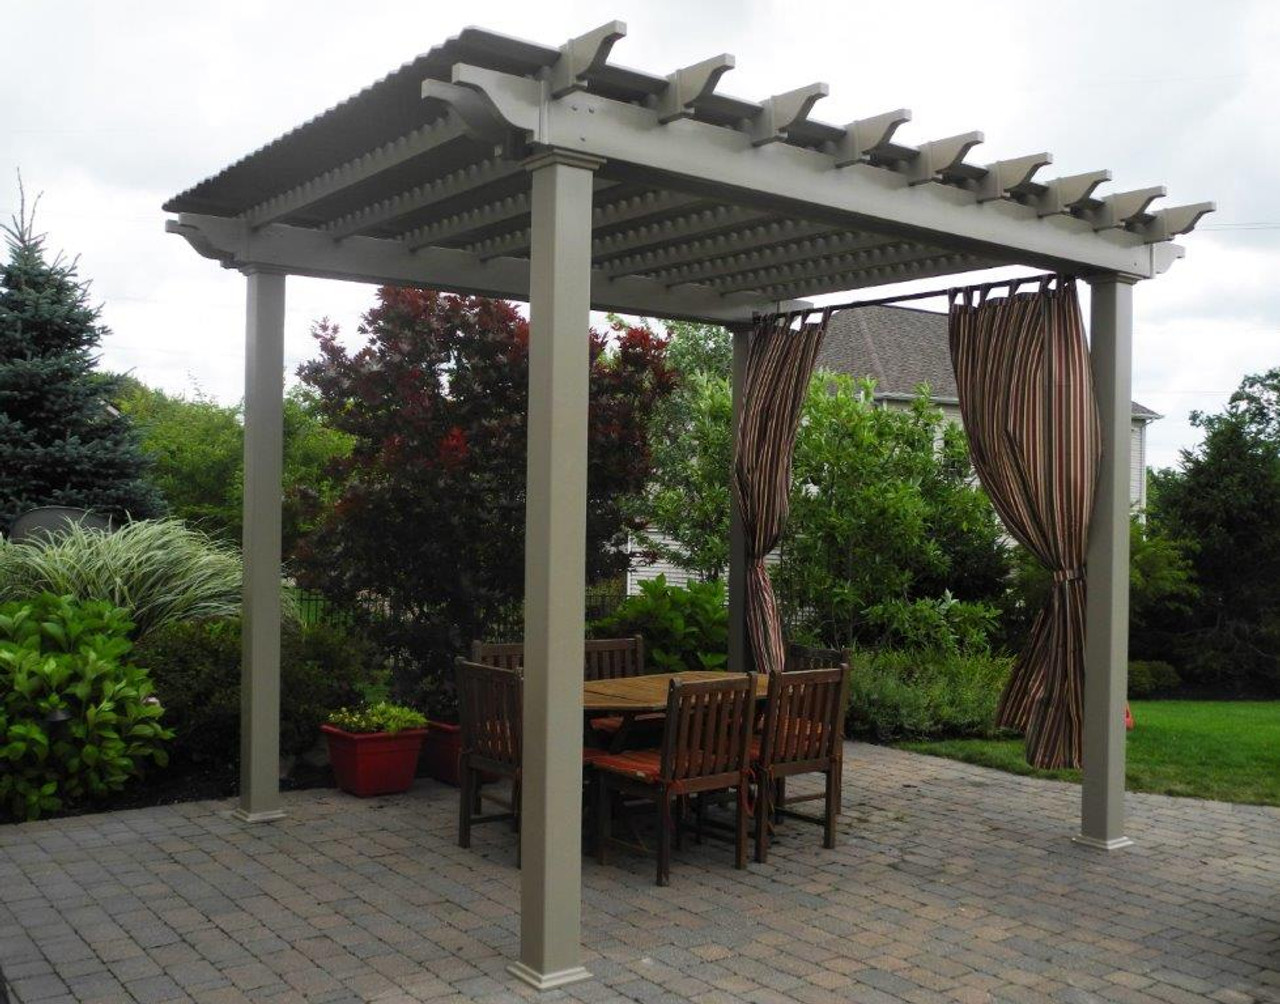 12x12 (roof span) Newport Pergola Kit, Clay color option, Shademax shade